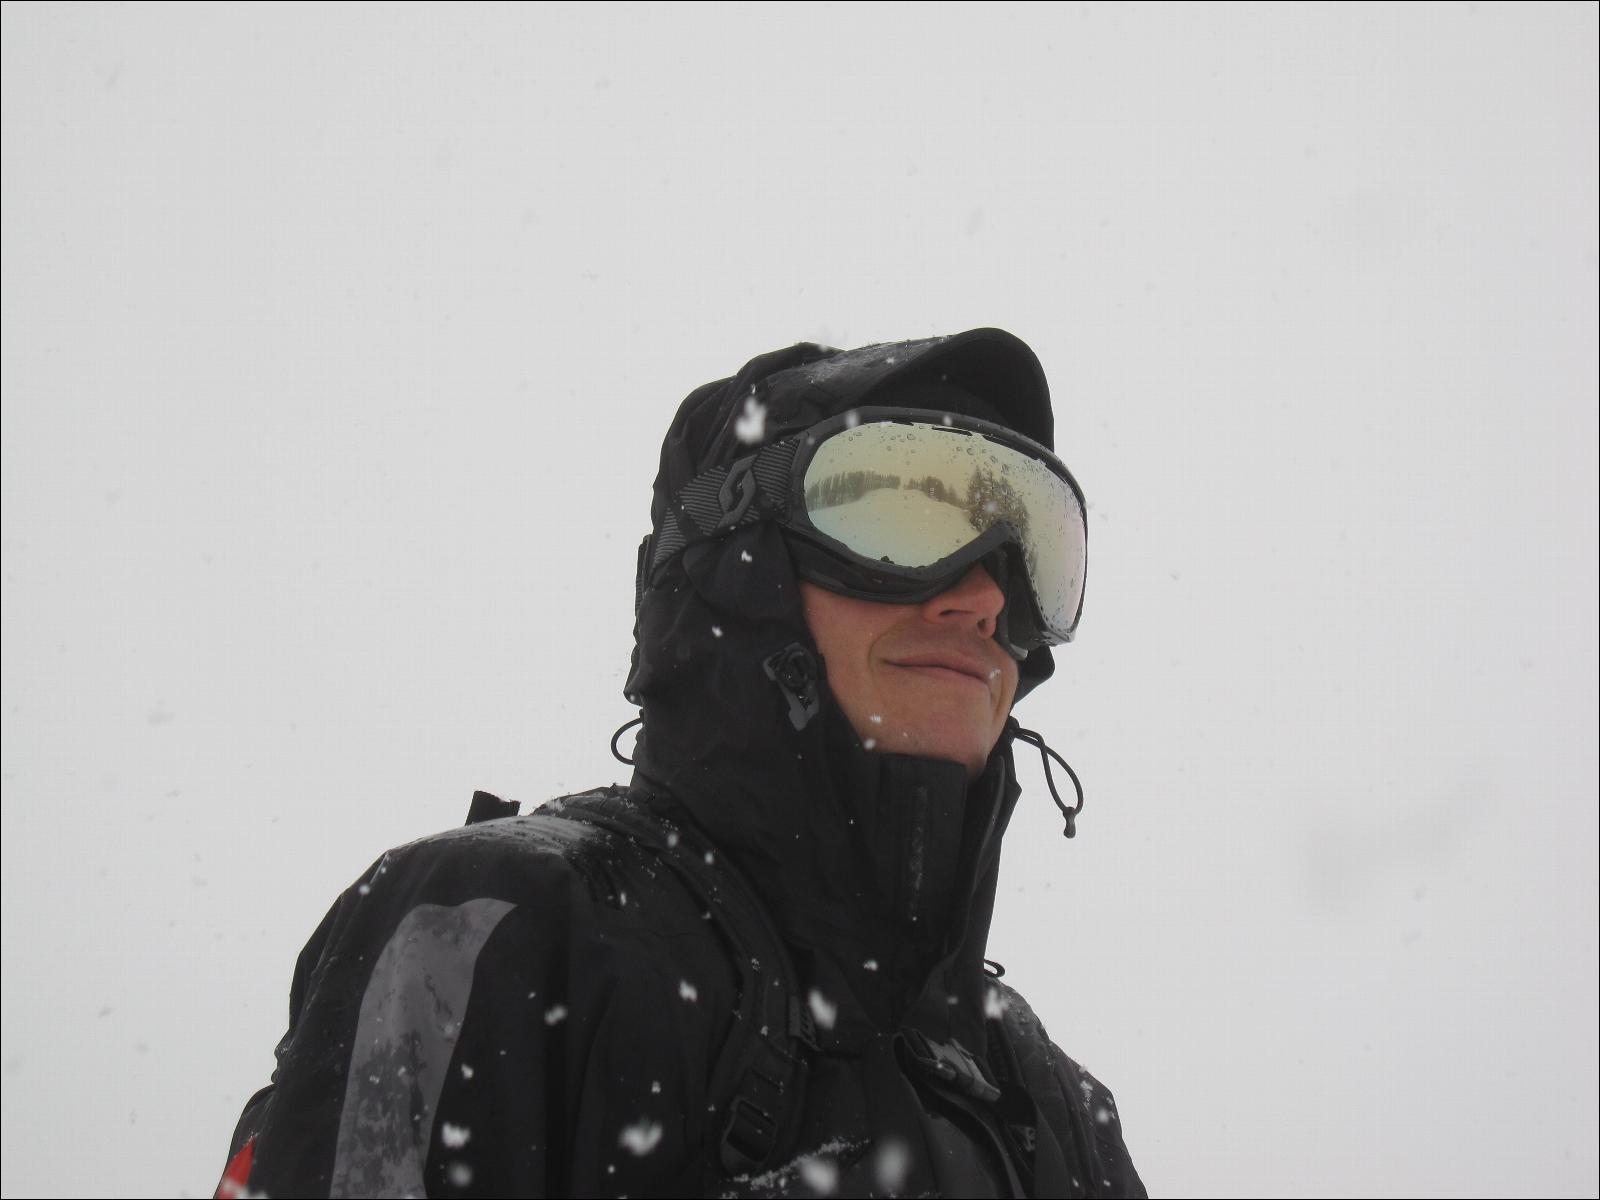 Masque de ski scott notice otg black ecran light for Ecran photochromique